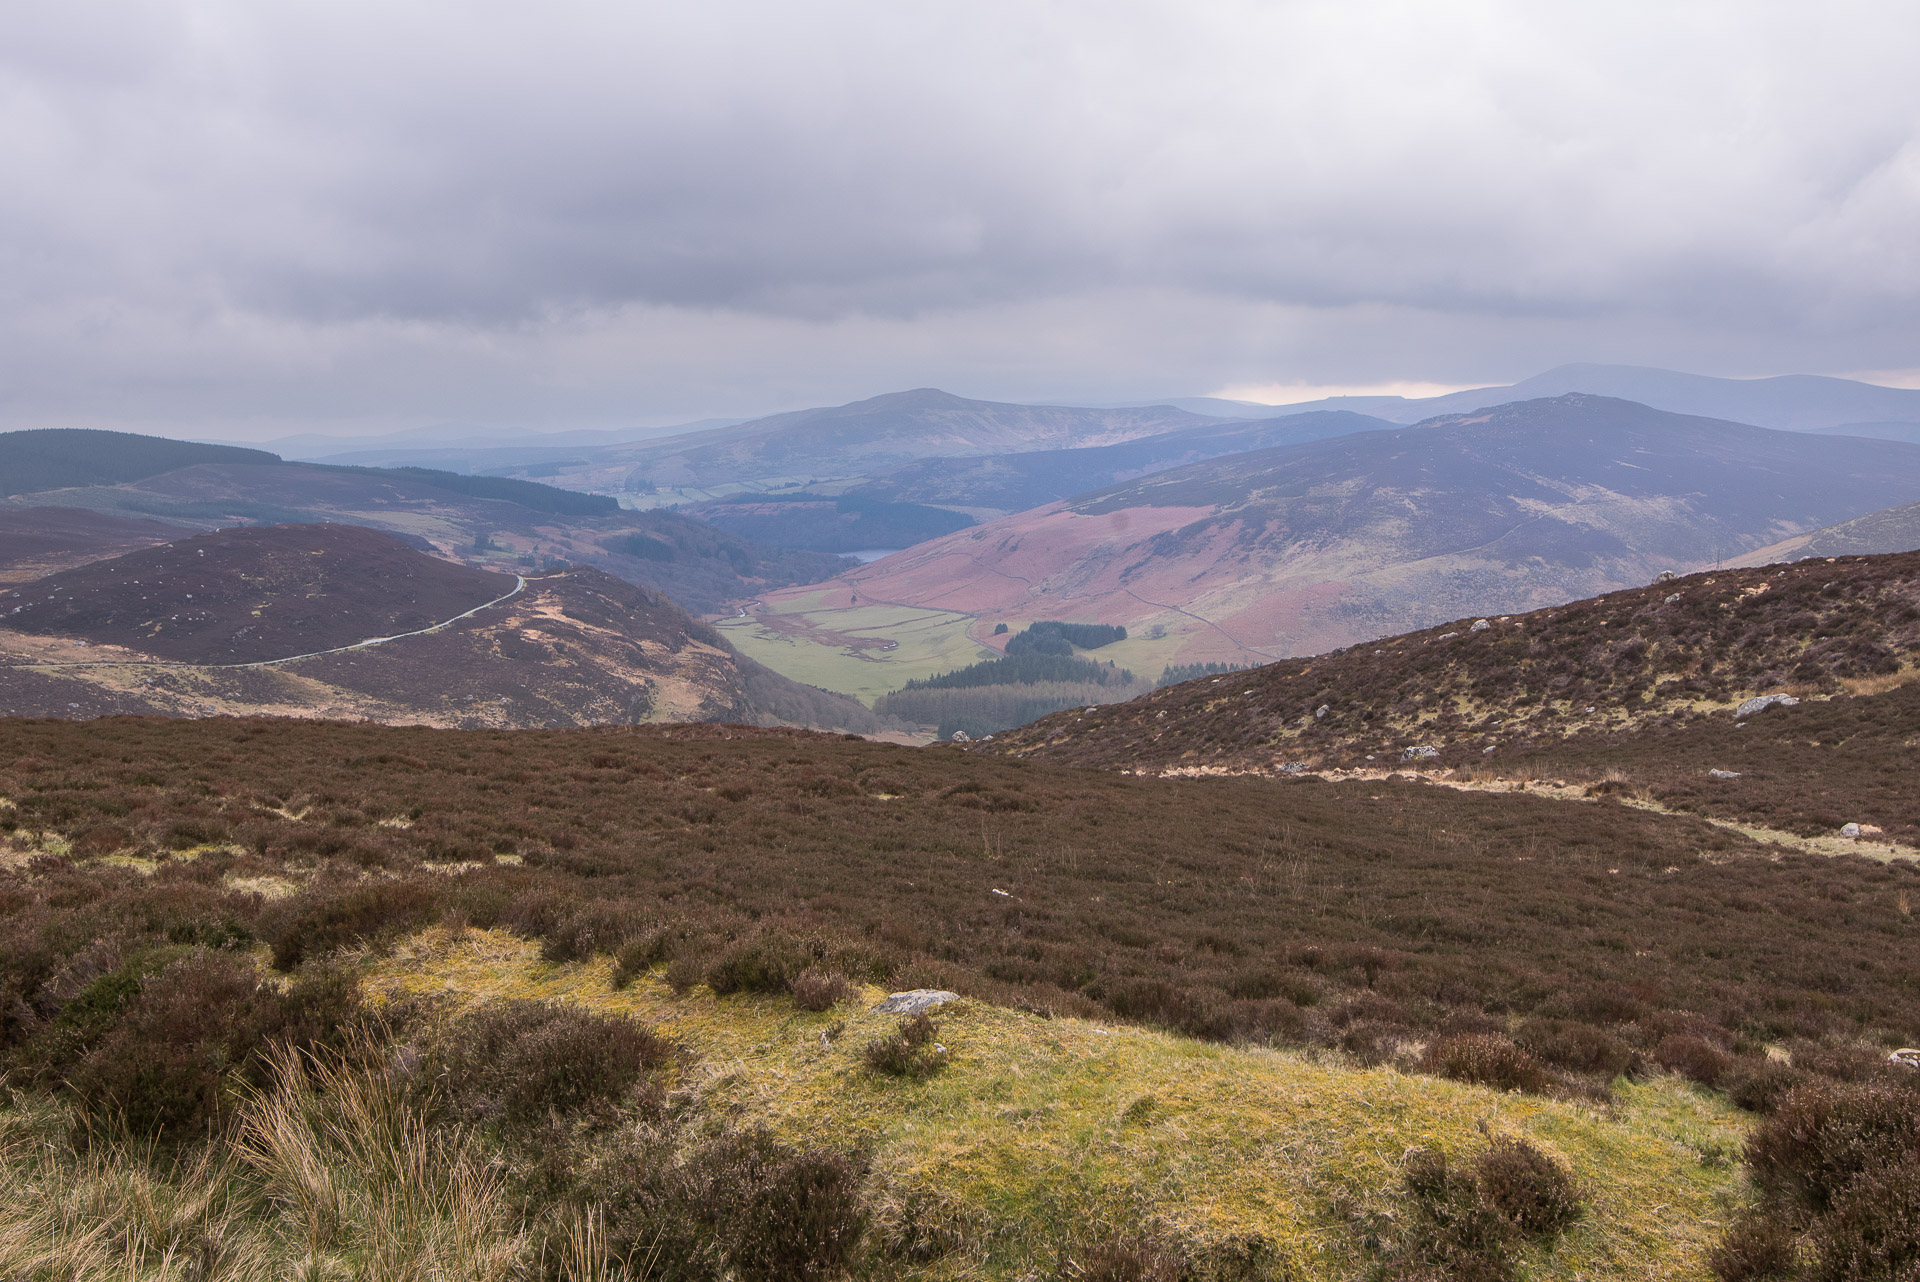 montanas-wicklow-irlanda03.jpg